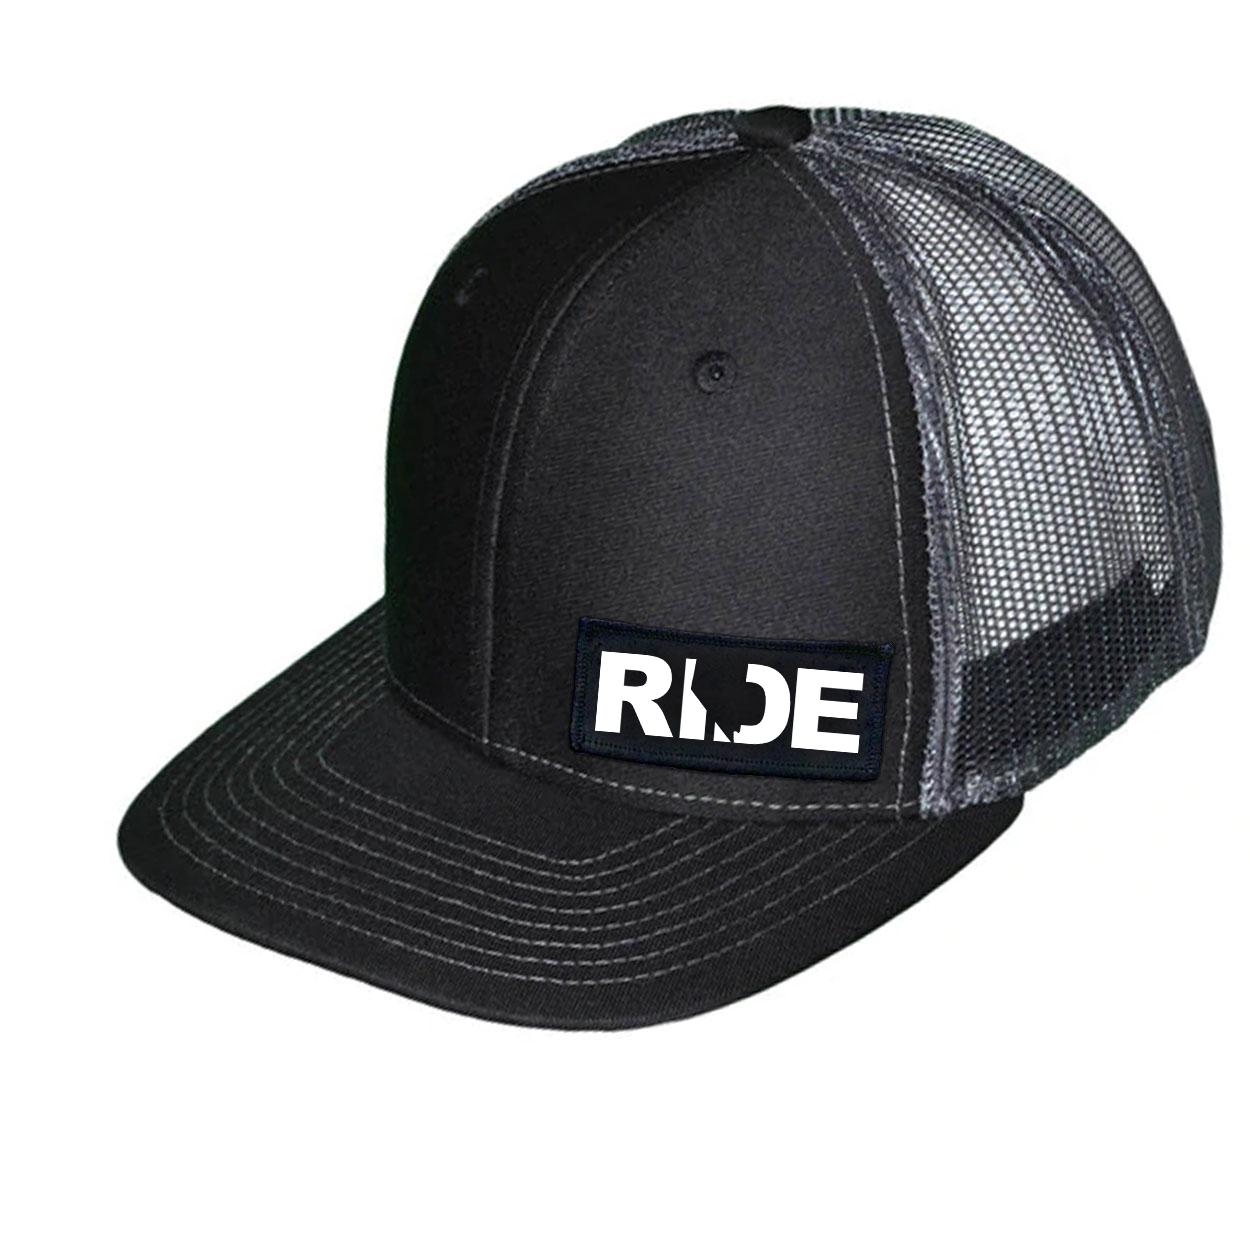 Ride Nevada Night Out Woven Patch Snapback Trucker Hat Black/Dark Gray (White Logo)